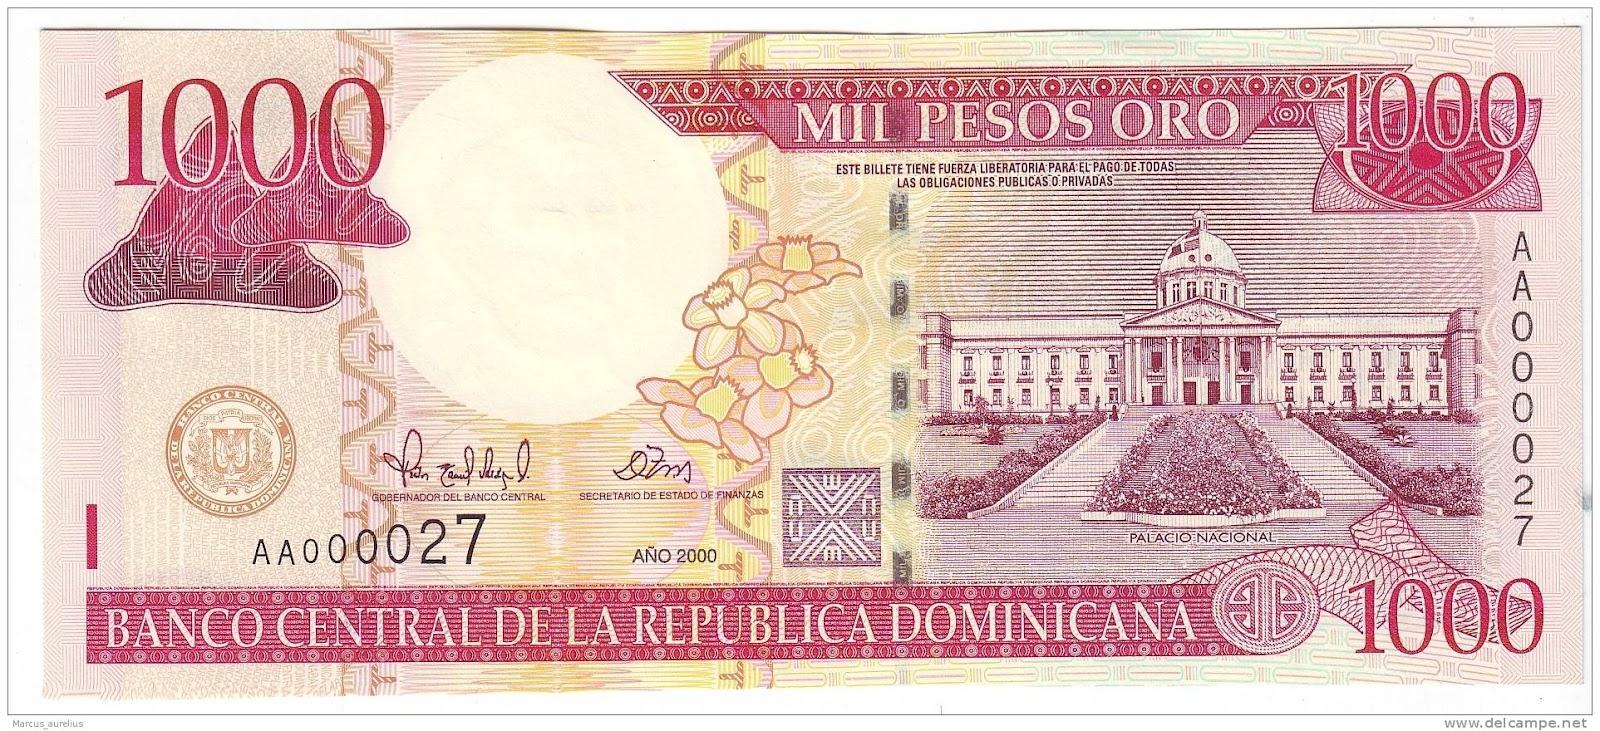 6 mil pesos en euros